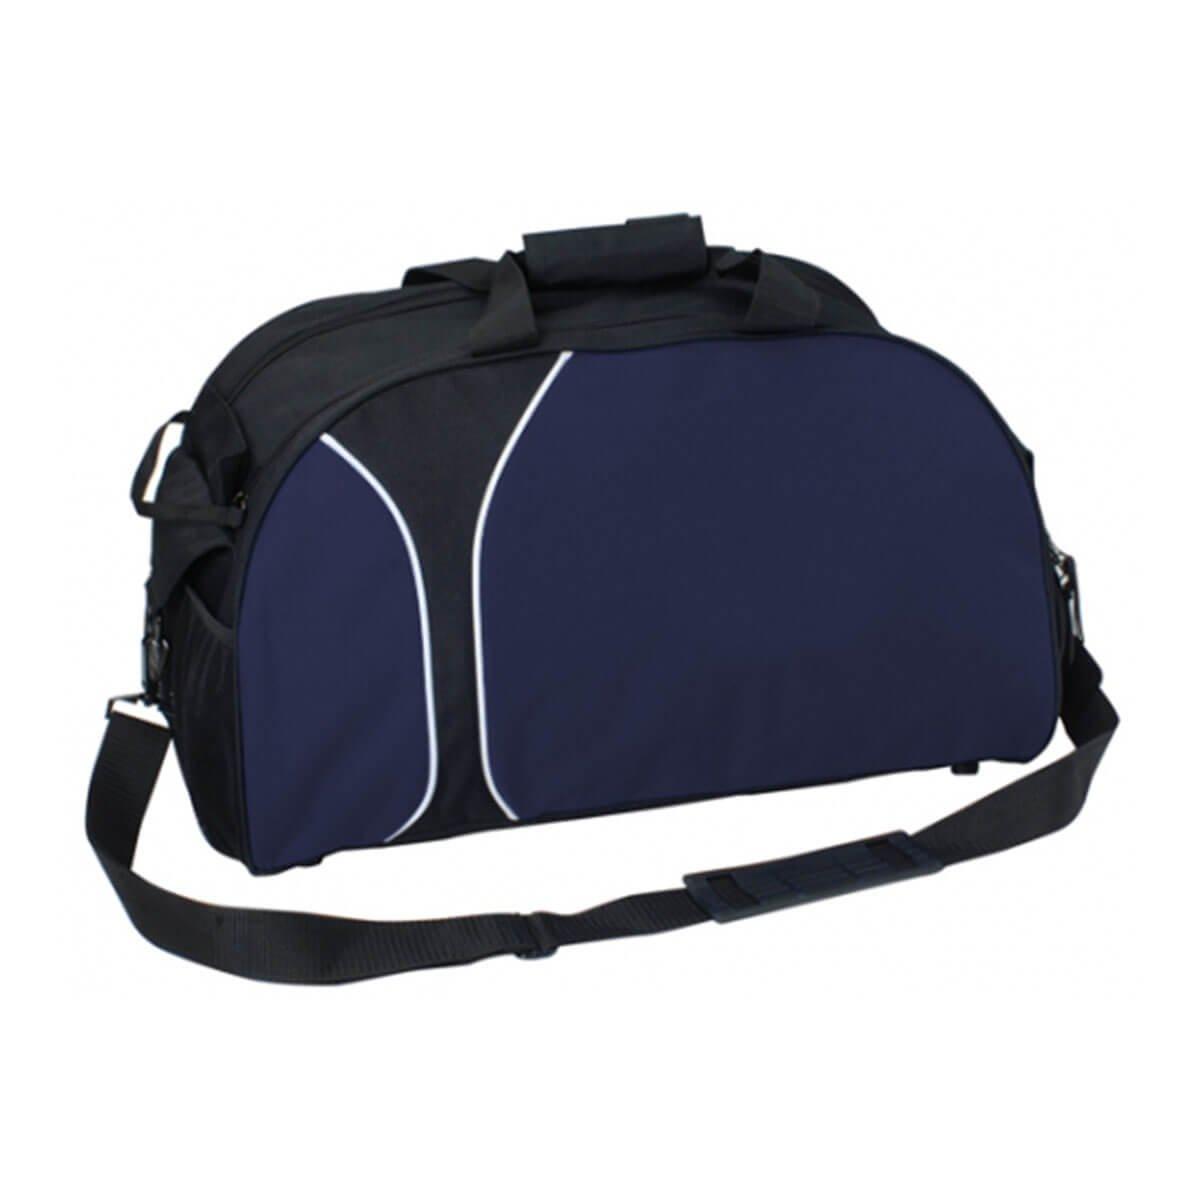 Travel Sports Bag-Black / Navy